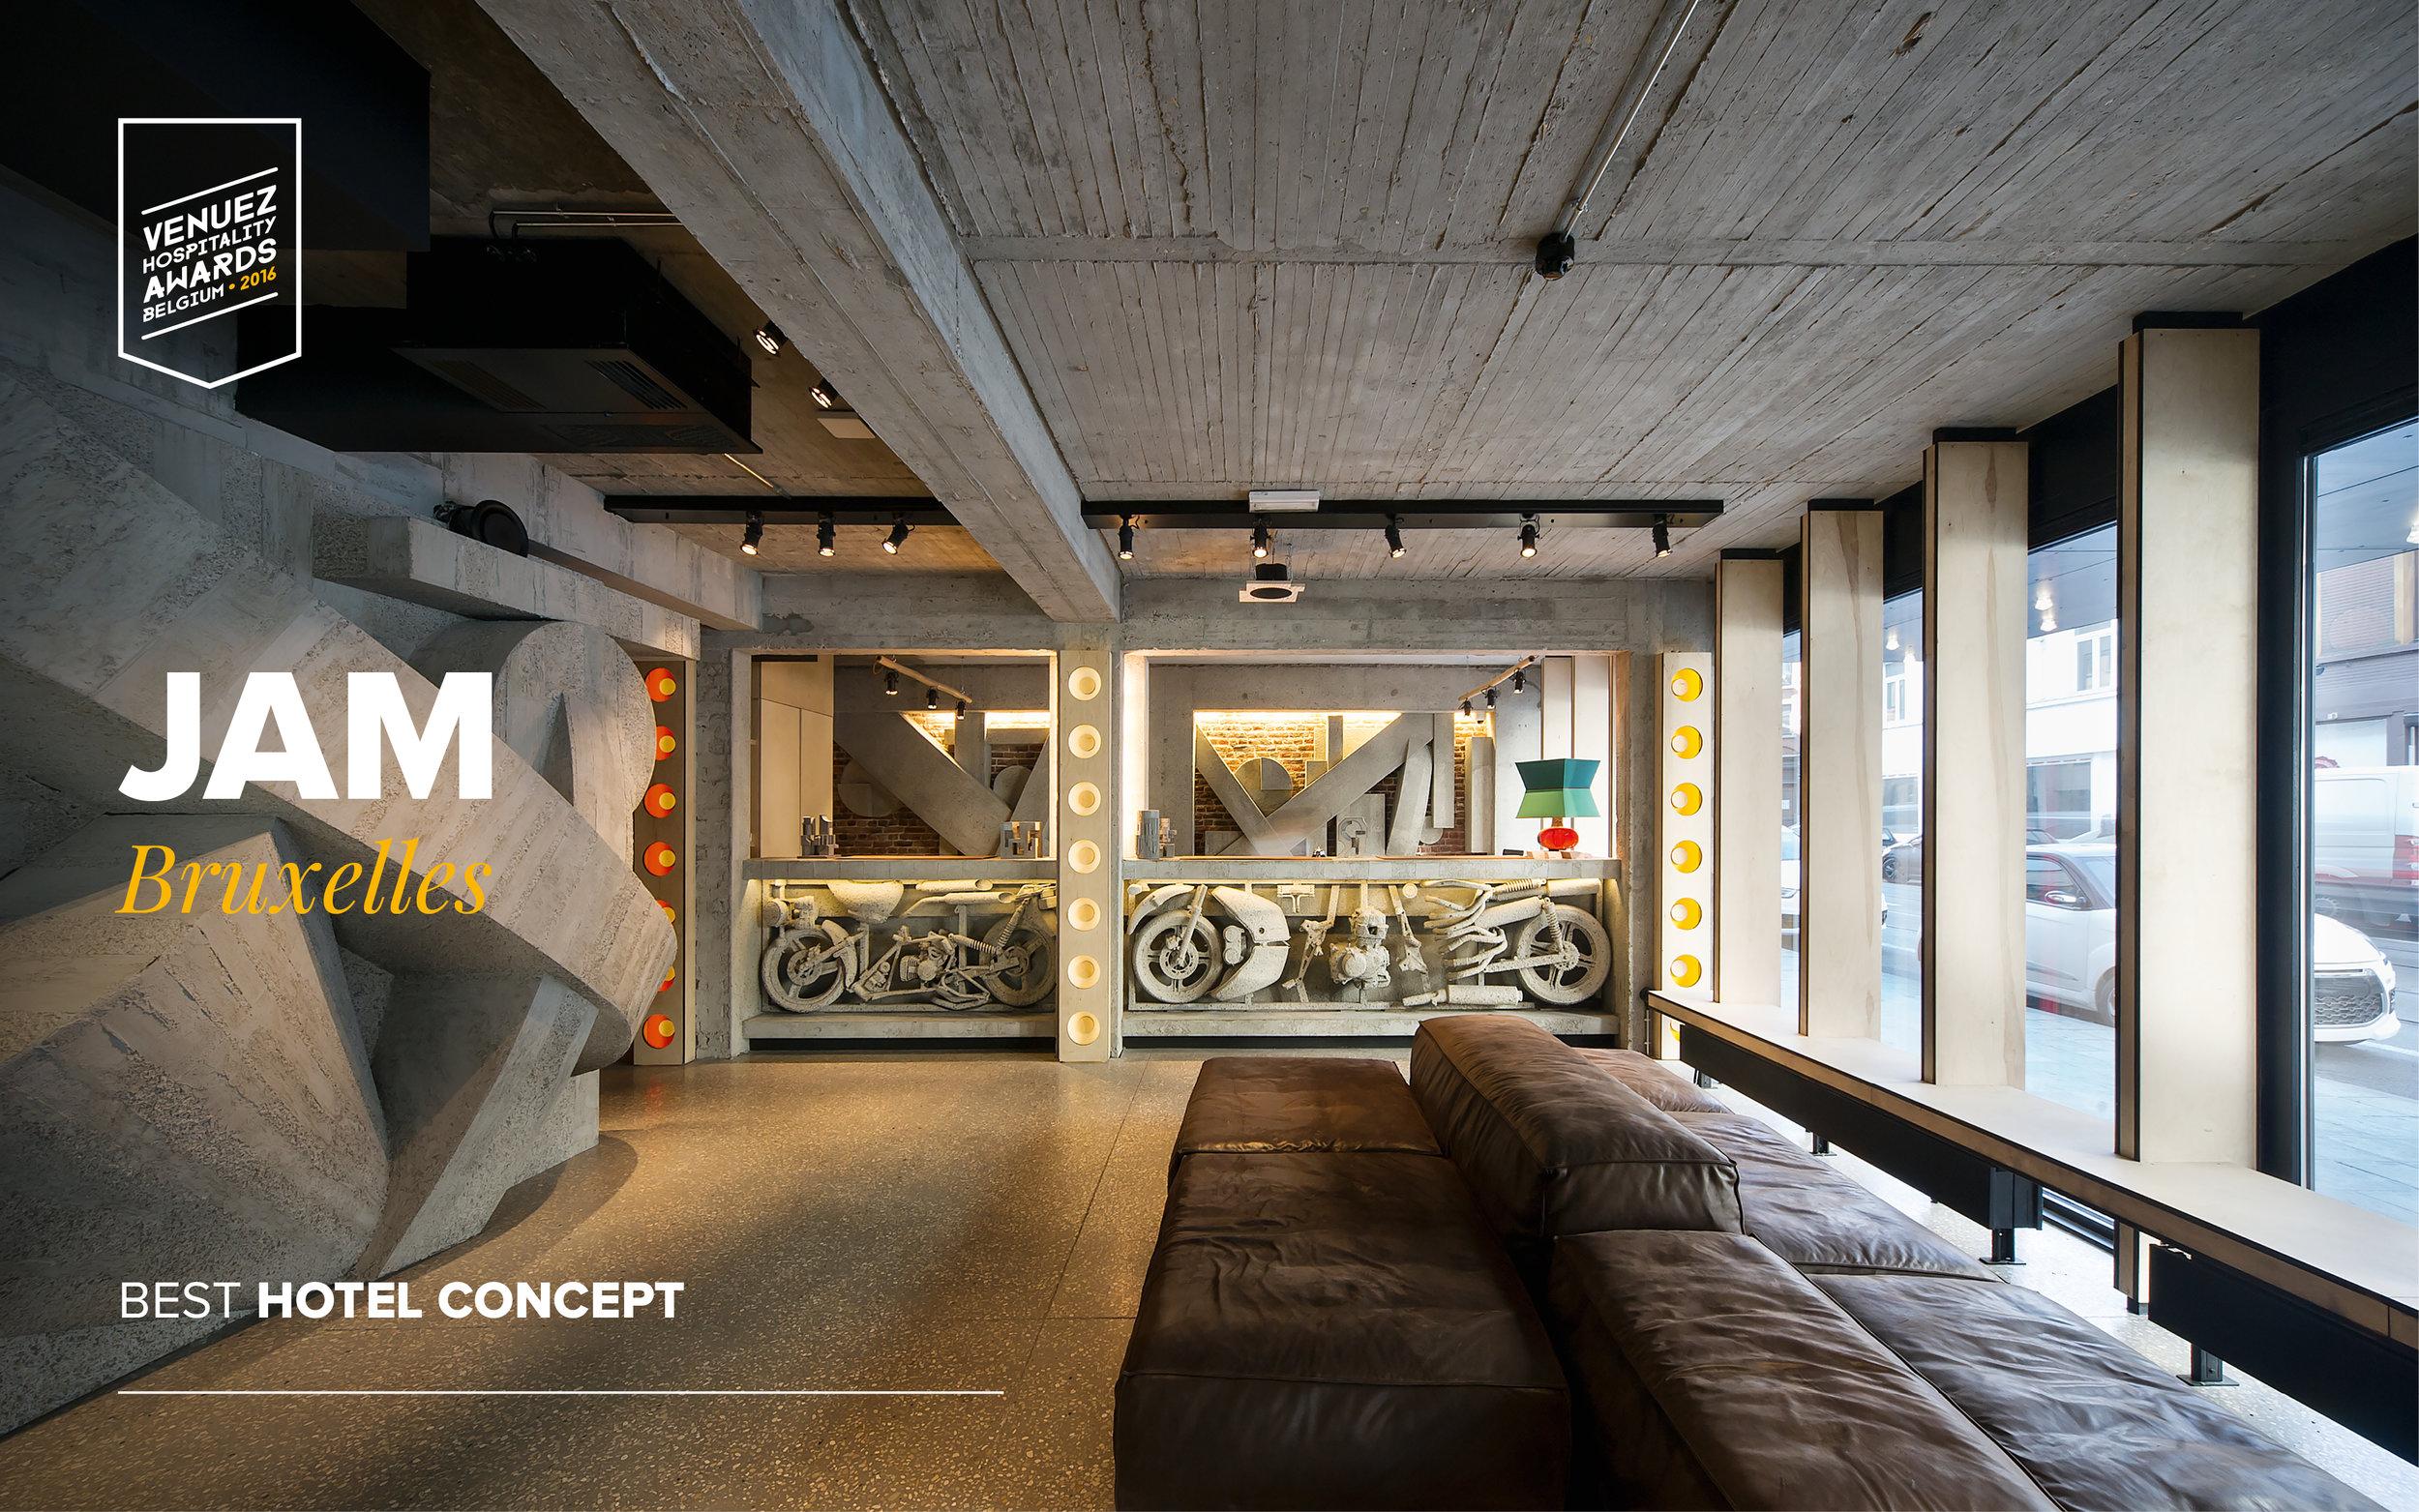 01 Best Hotel Concept 2.jpg